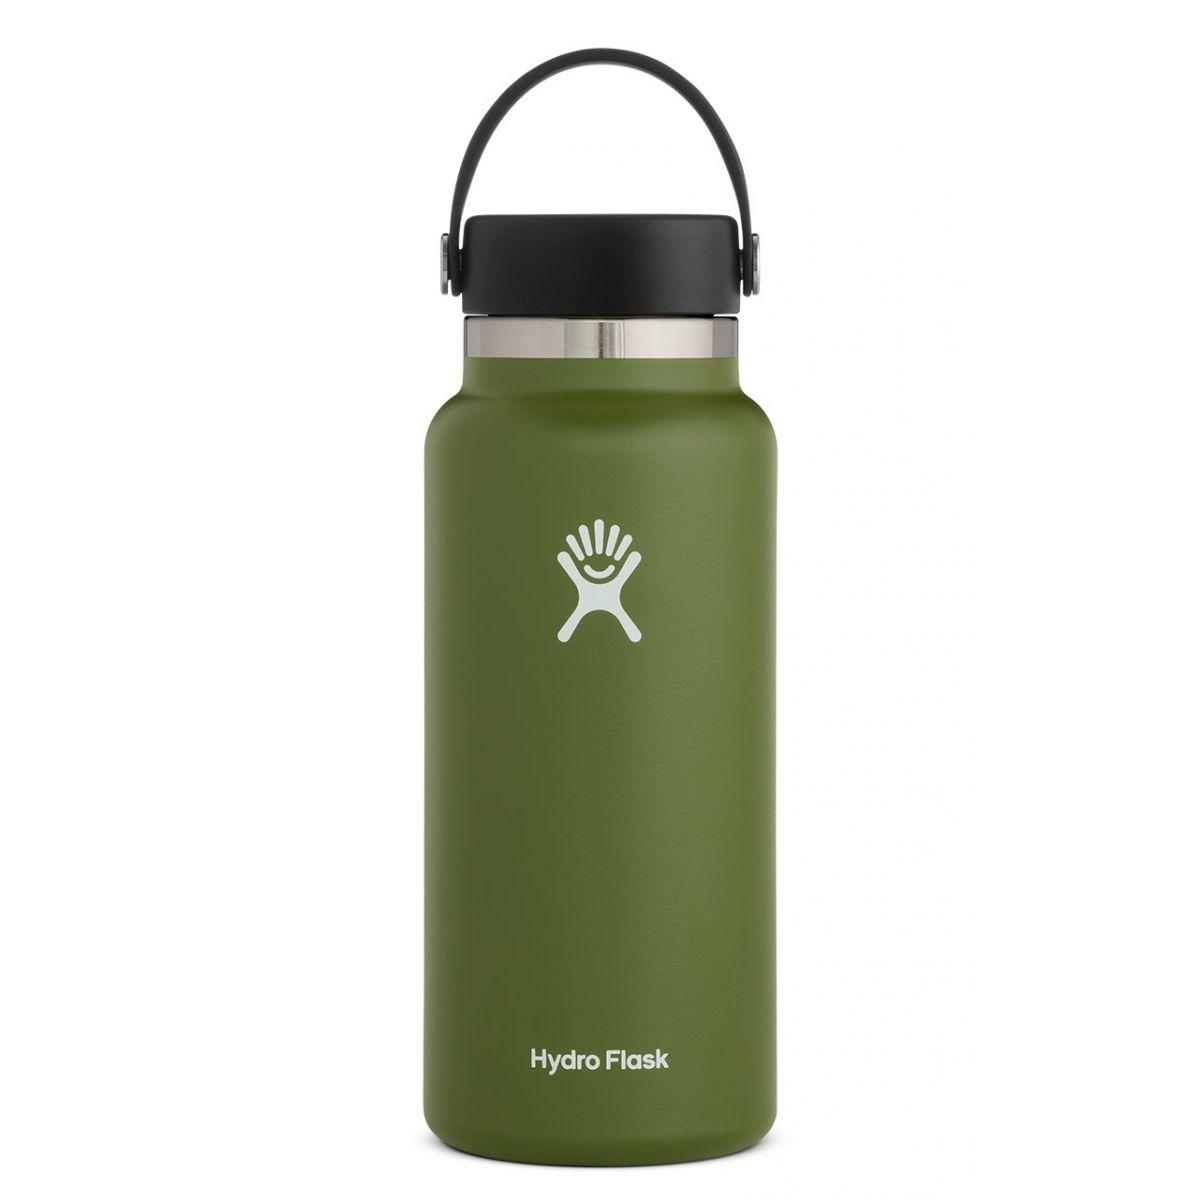 Hydroflask 32 oz flex cap olive